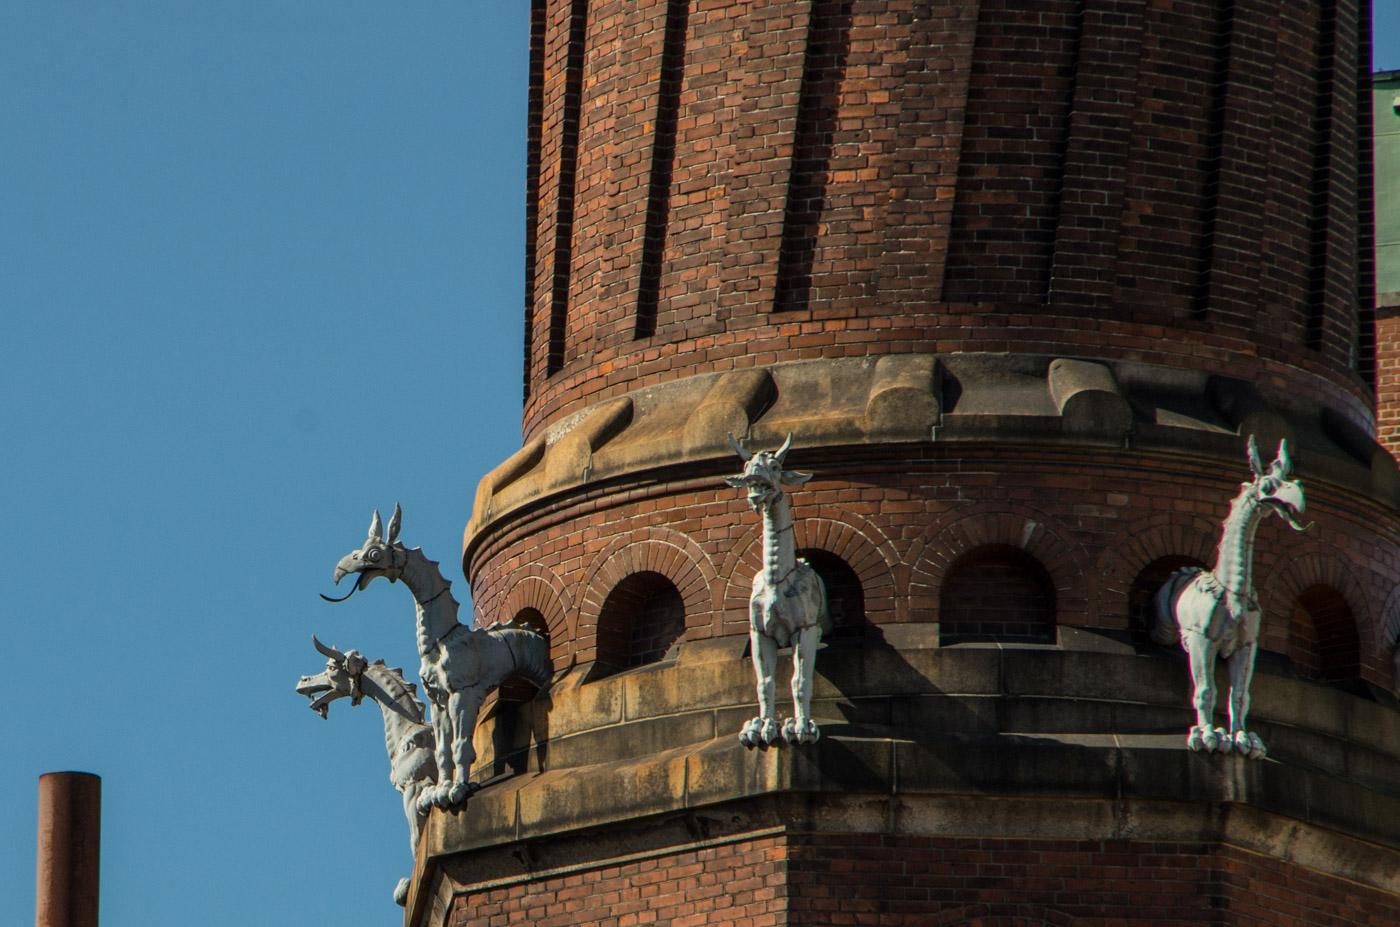 Tiny dragon-horses on a giant chimney in Carlsberg